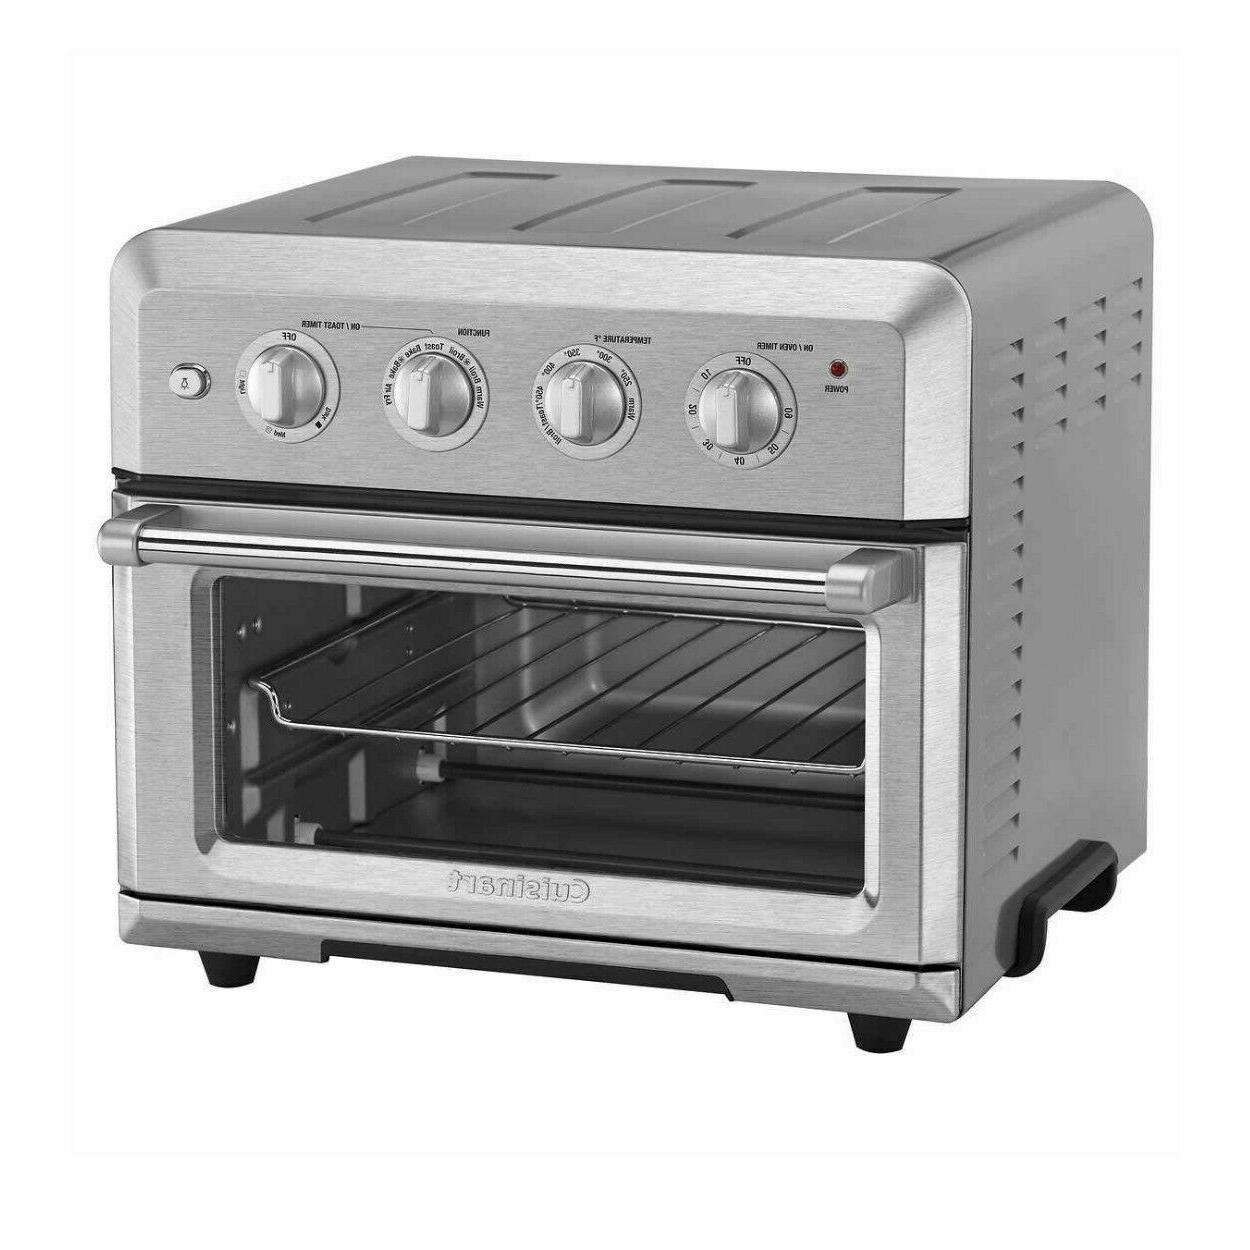 ctoa 120 convection toaster oven air fryer